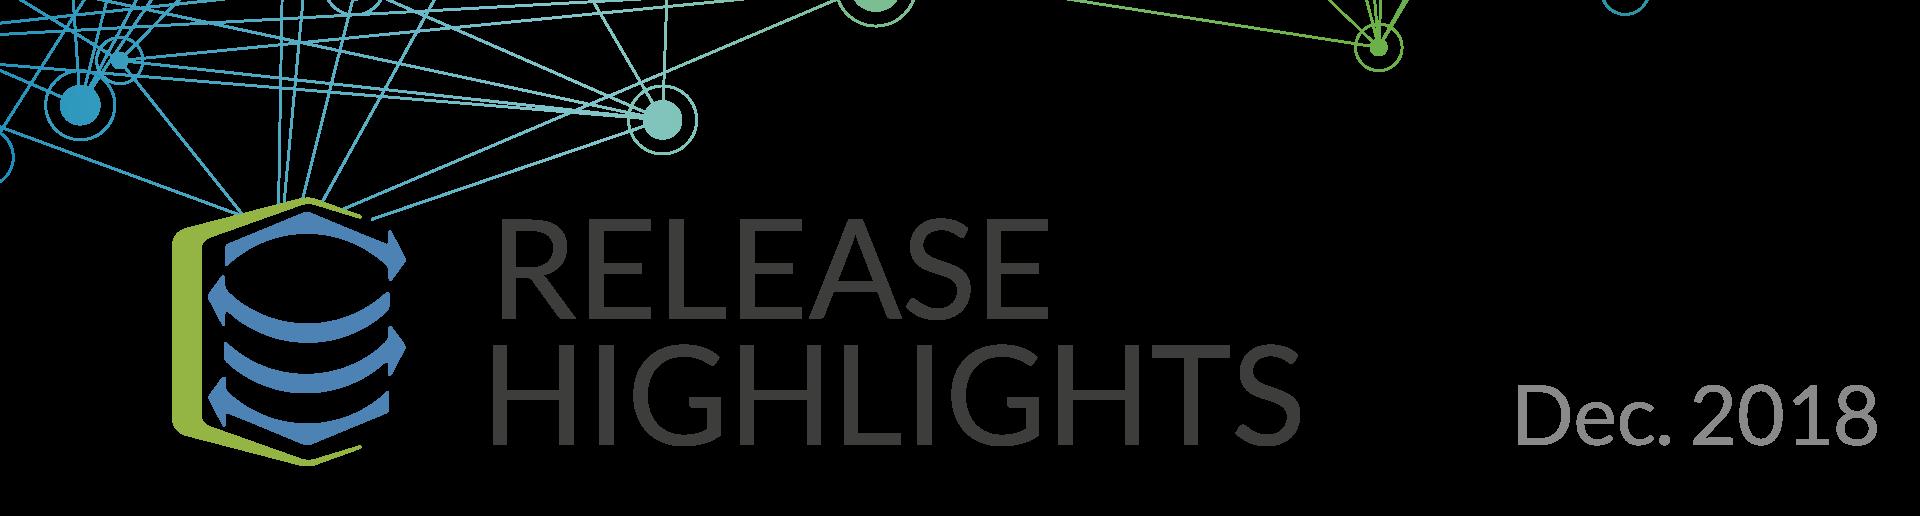 dec_highlights_header.png